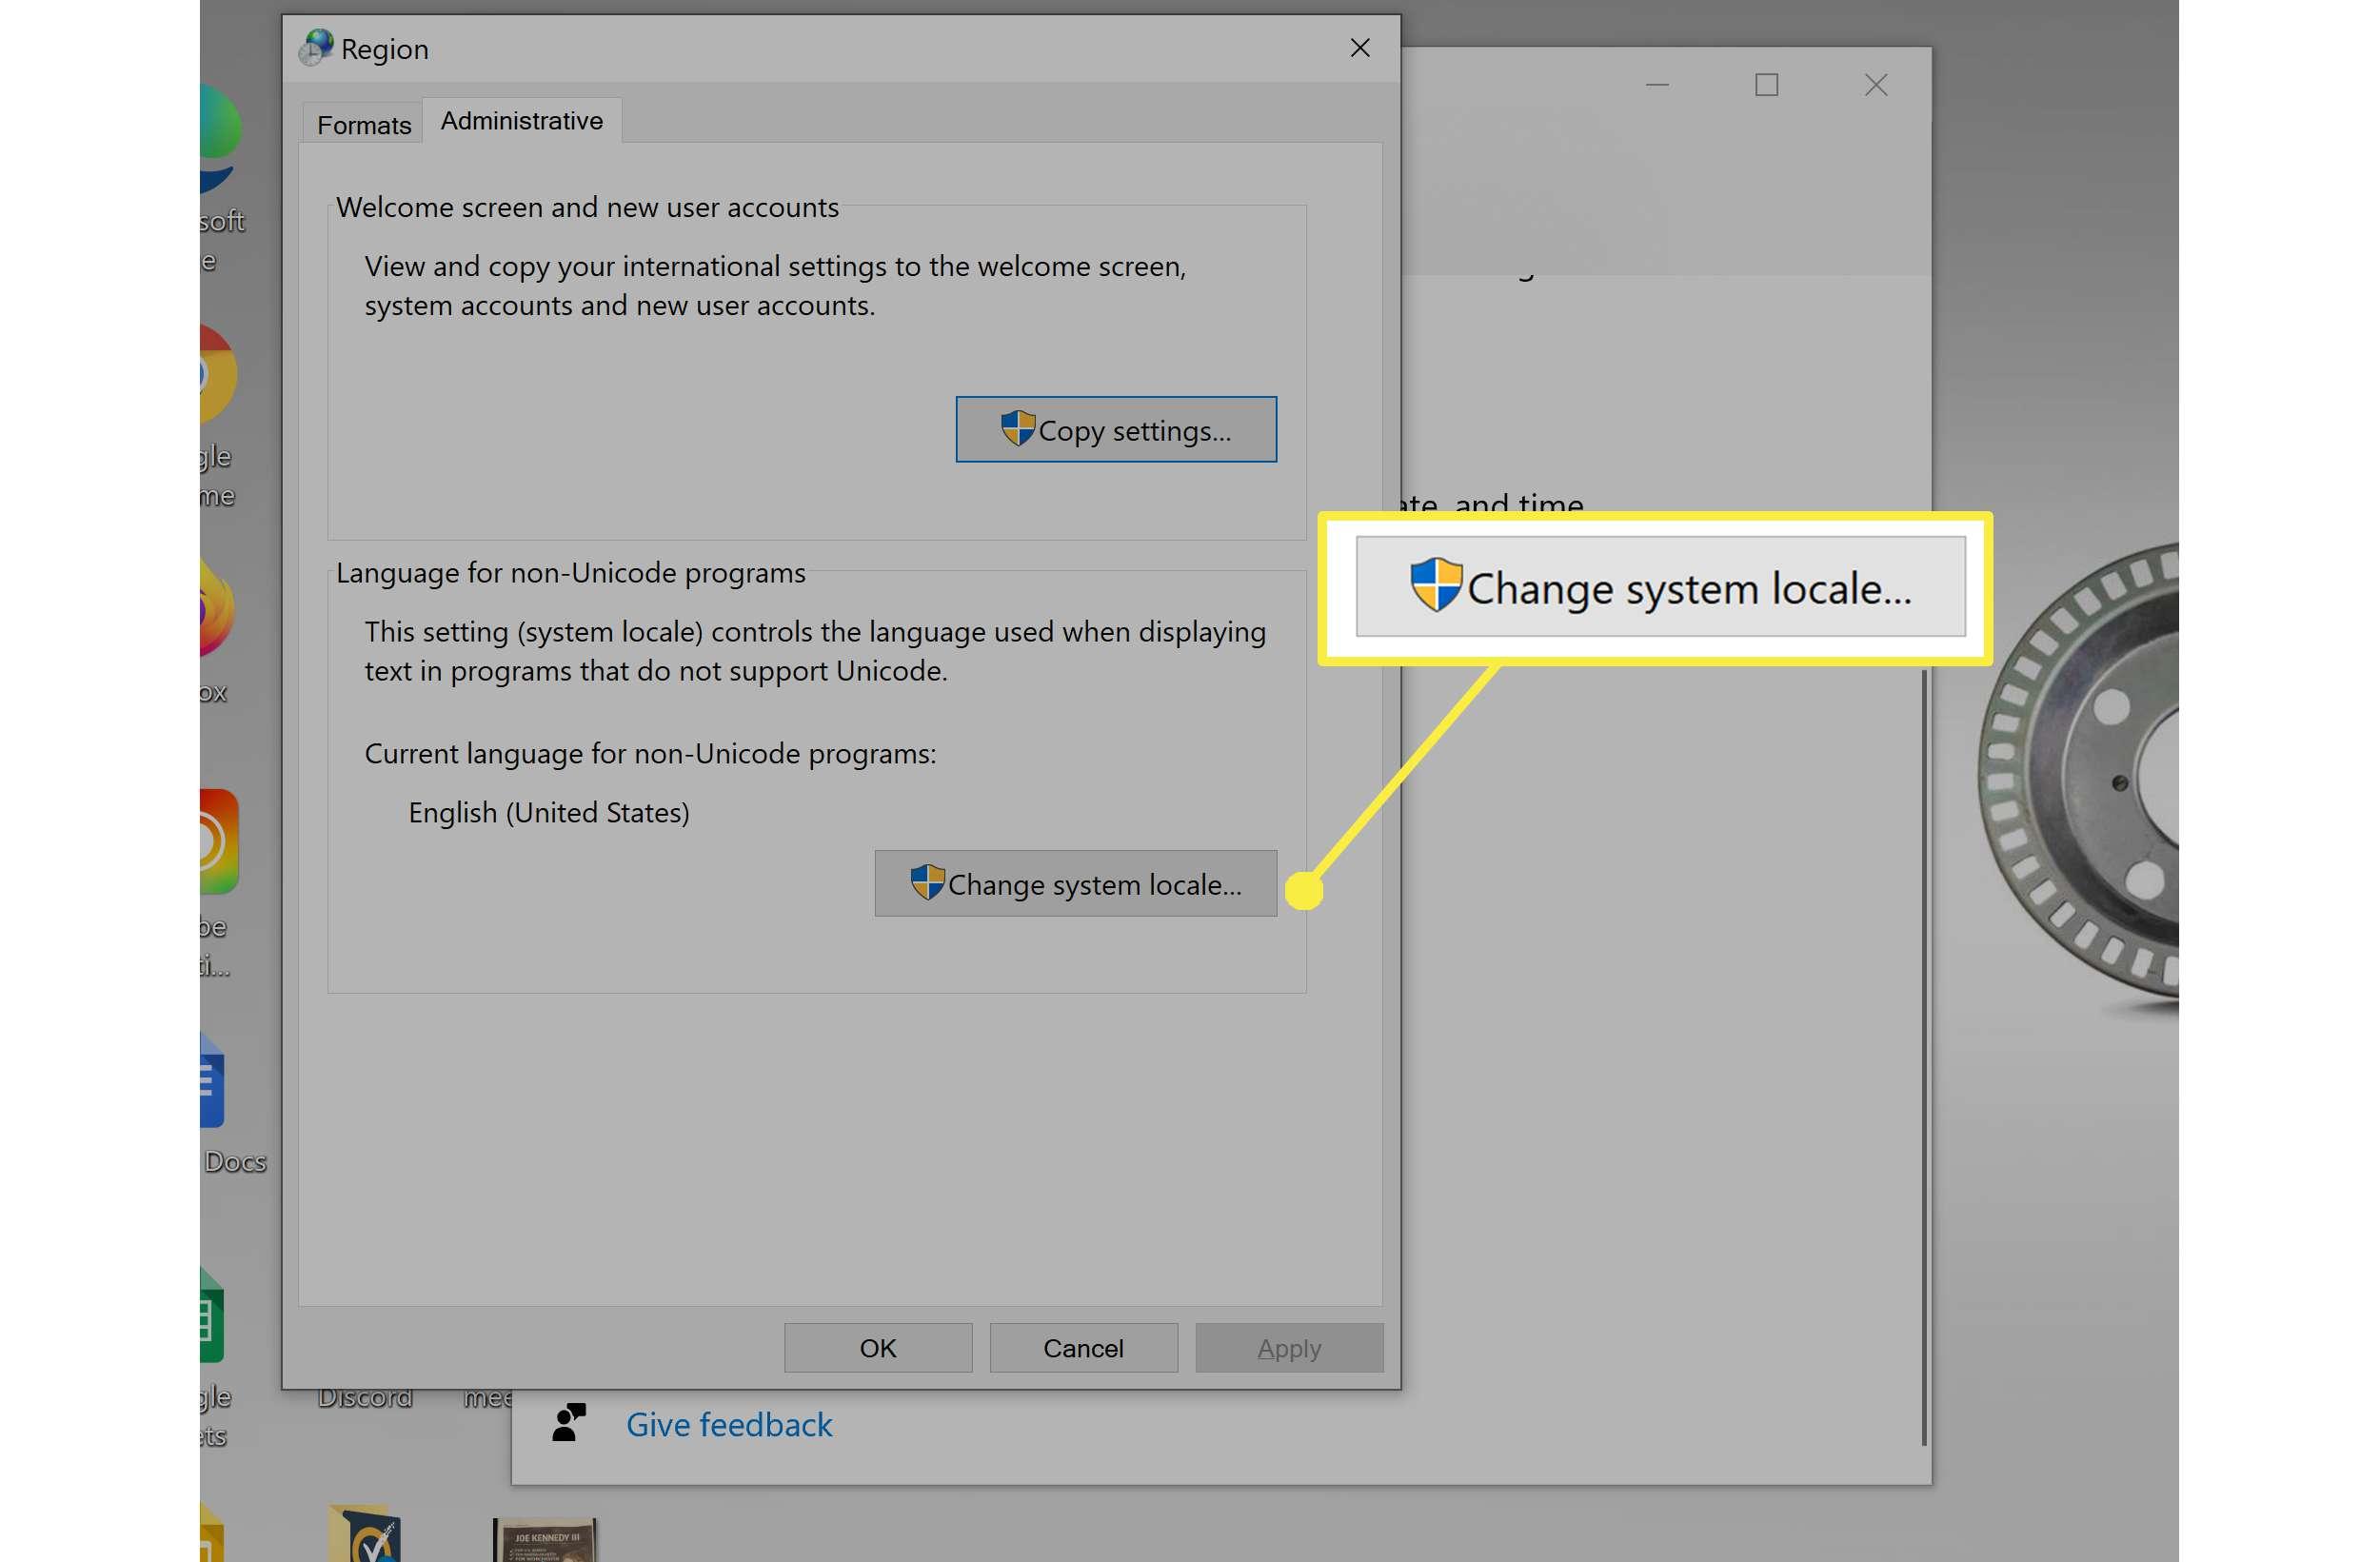 Changing region settings in Windows 10.